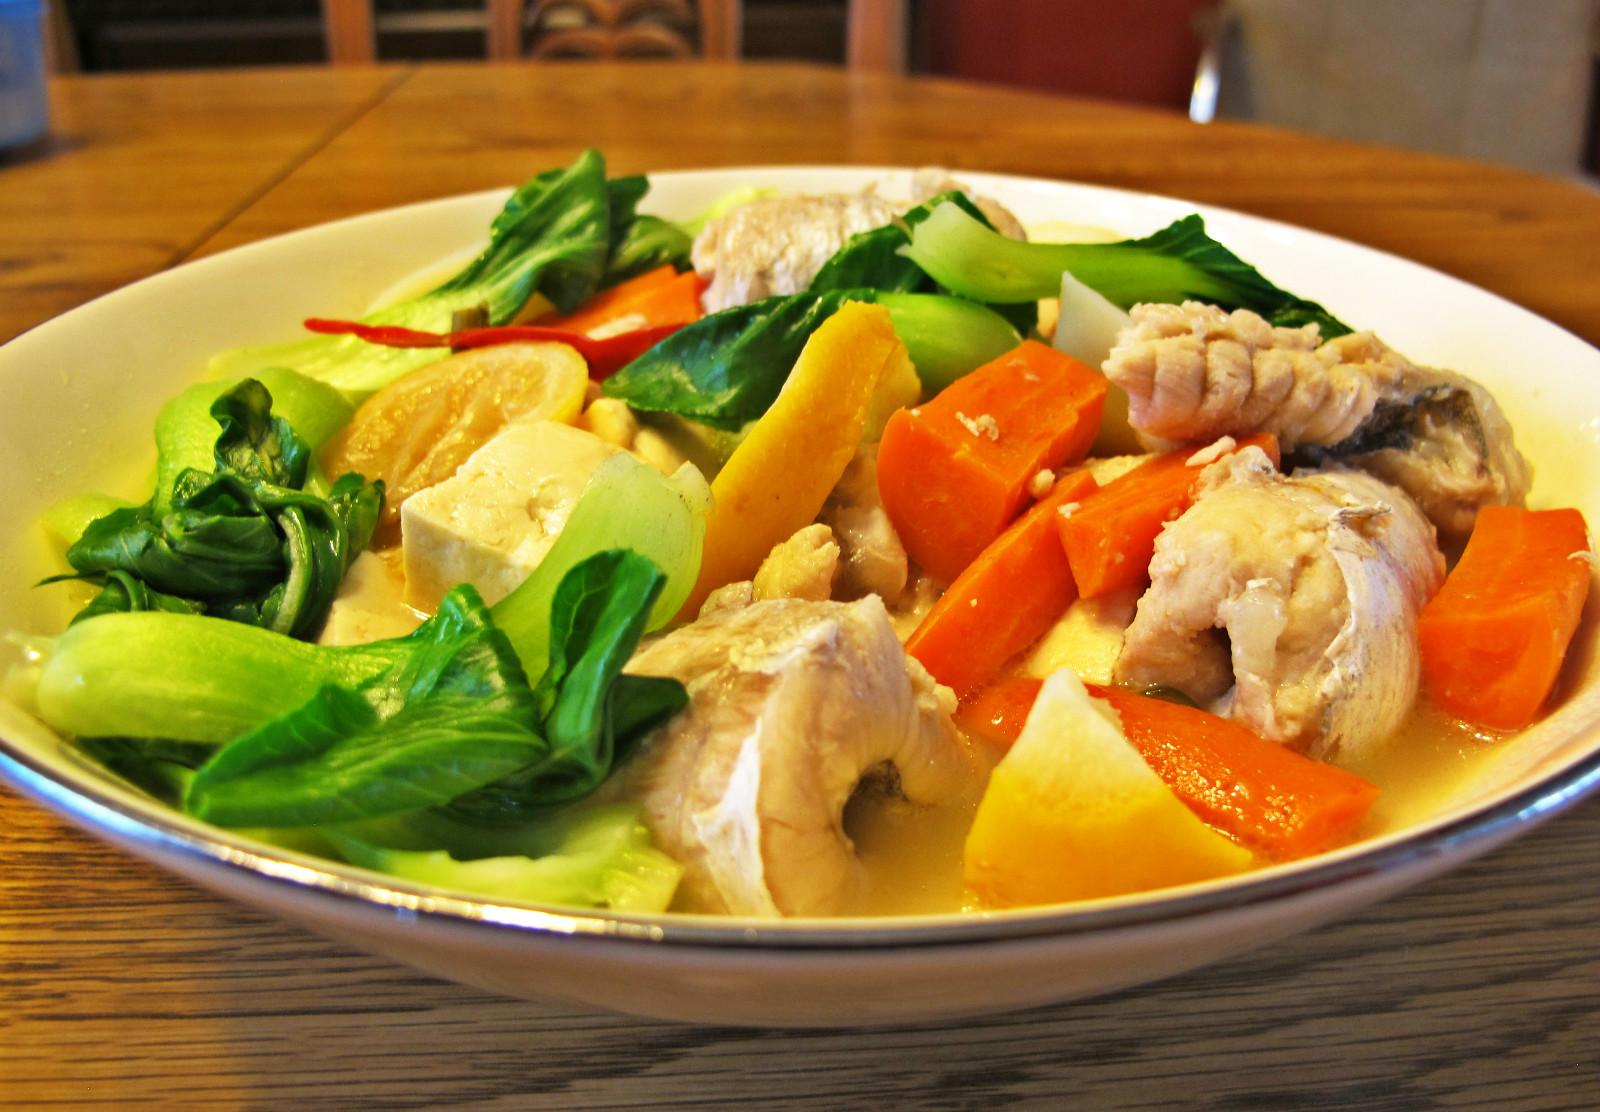 Lemon fish with tofu dish